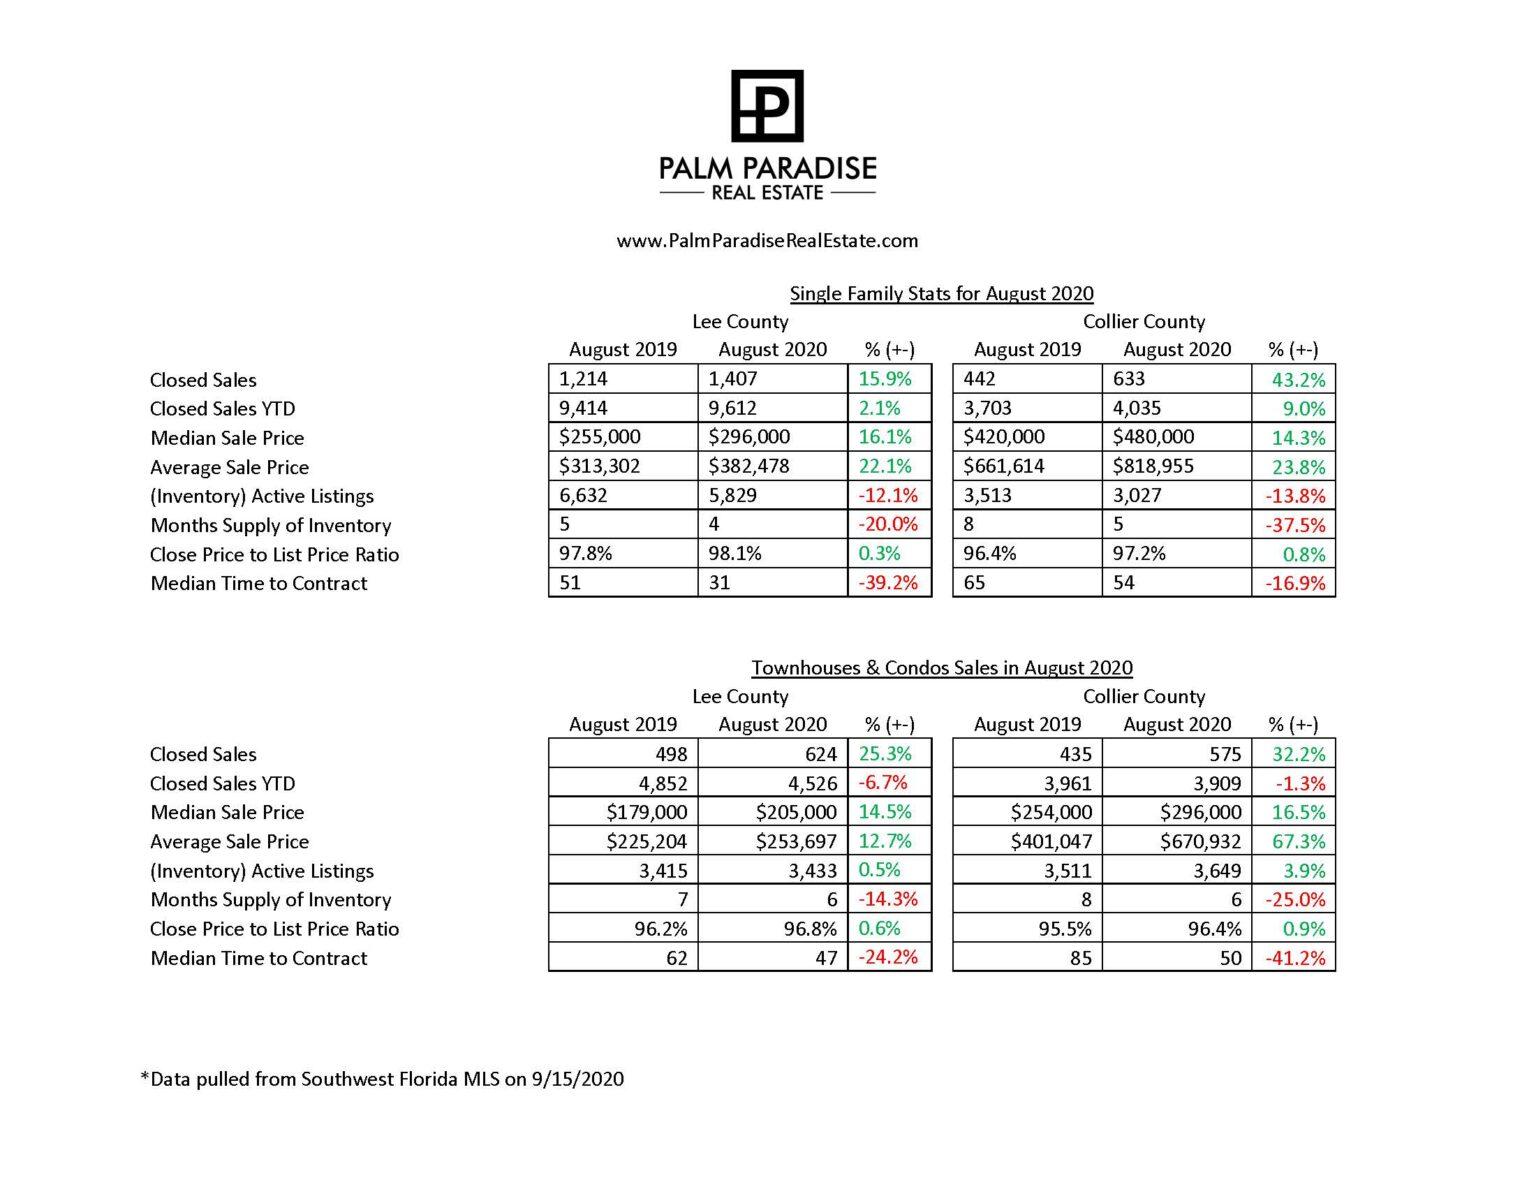 Market Statistics for August 2020